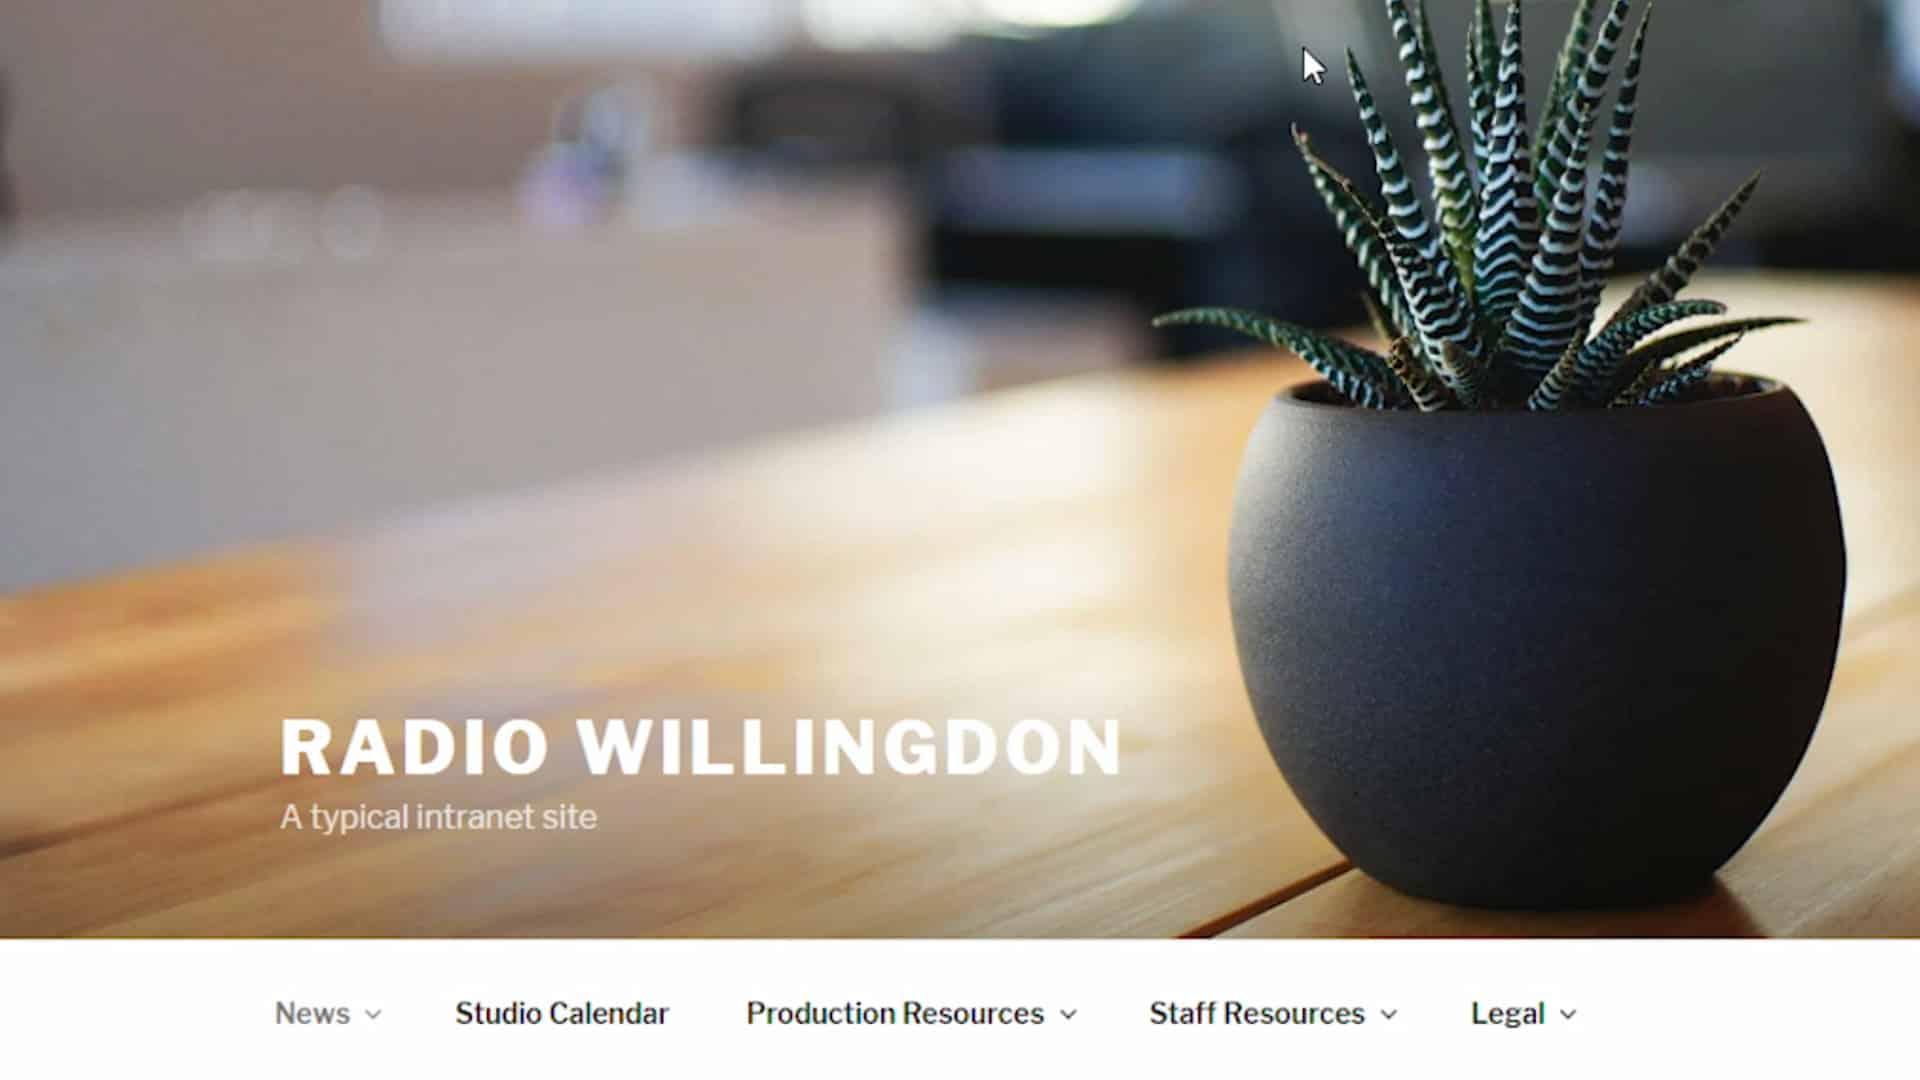 [Lynda] WordPress: Creating an Intranet Website